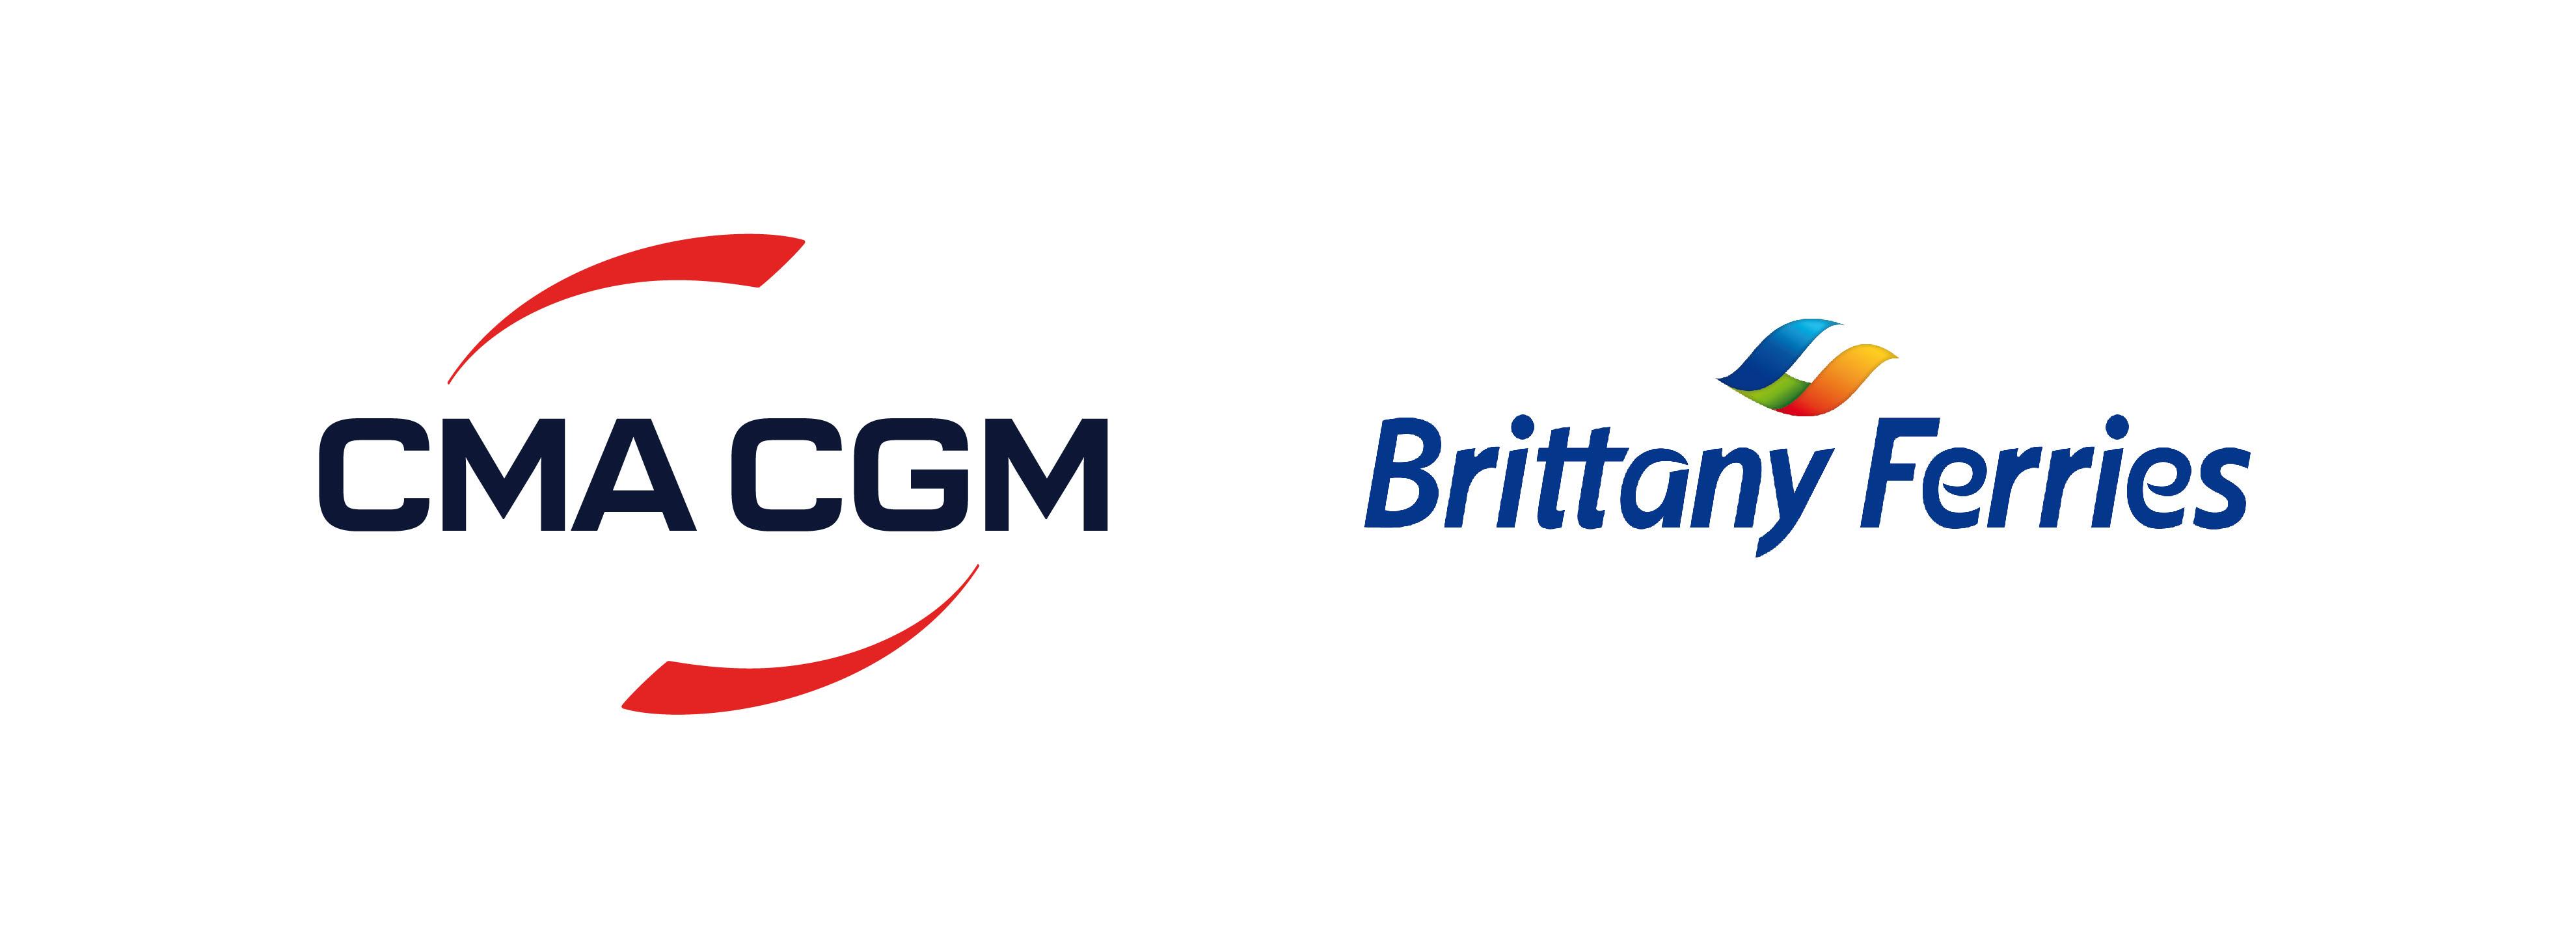 CMA CGM investit 25 M€ pour redresser Brittany Ferries